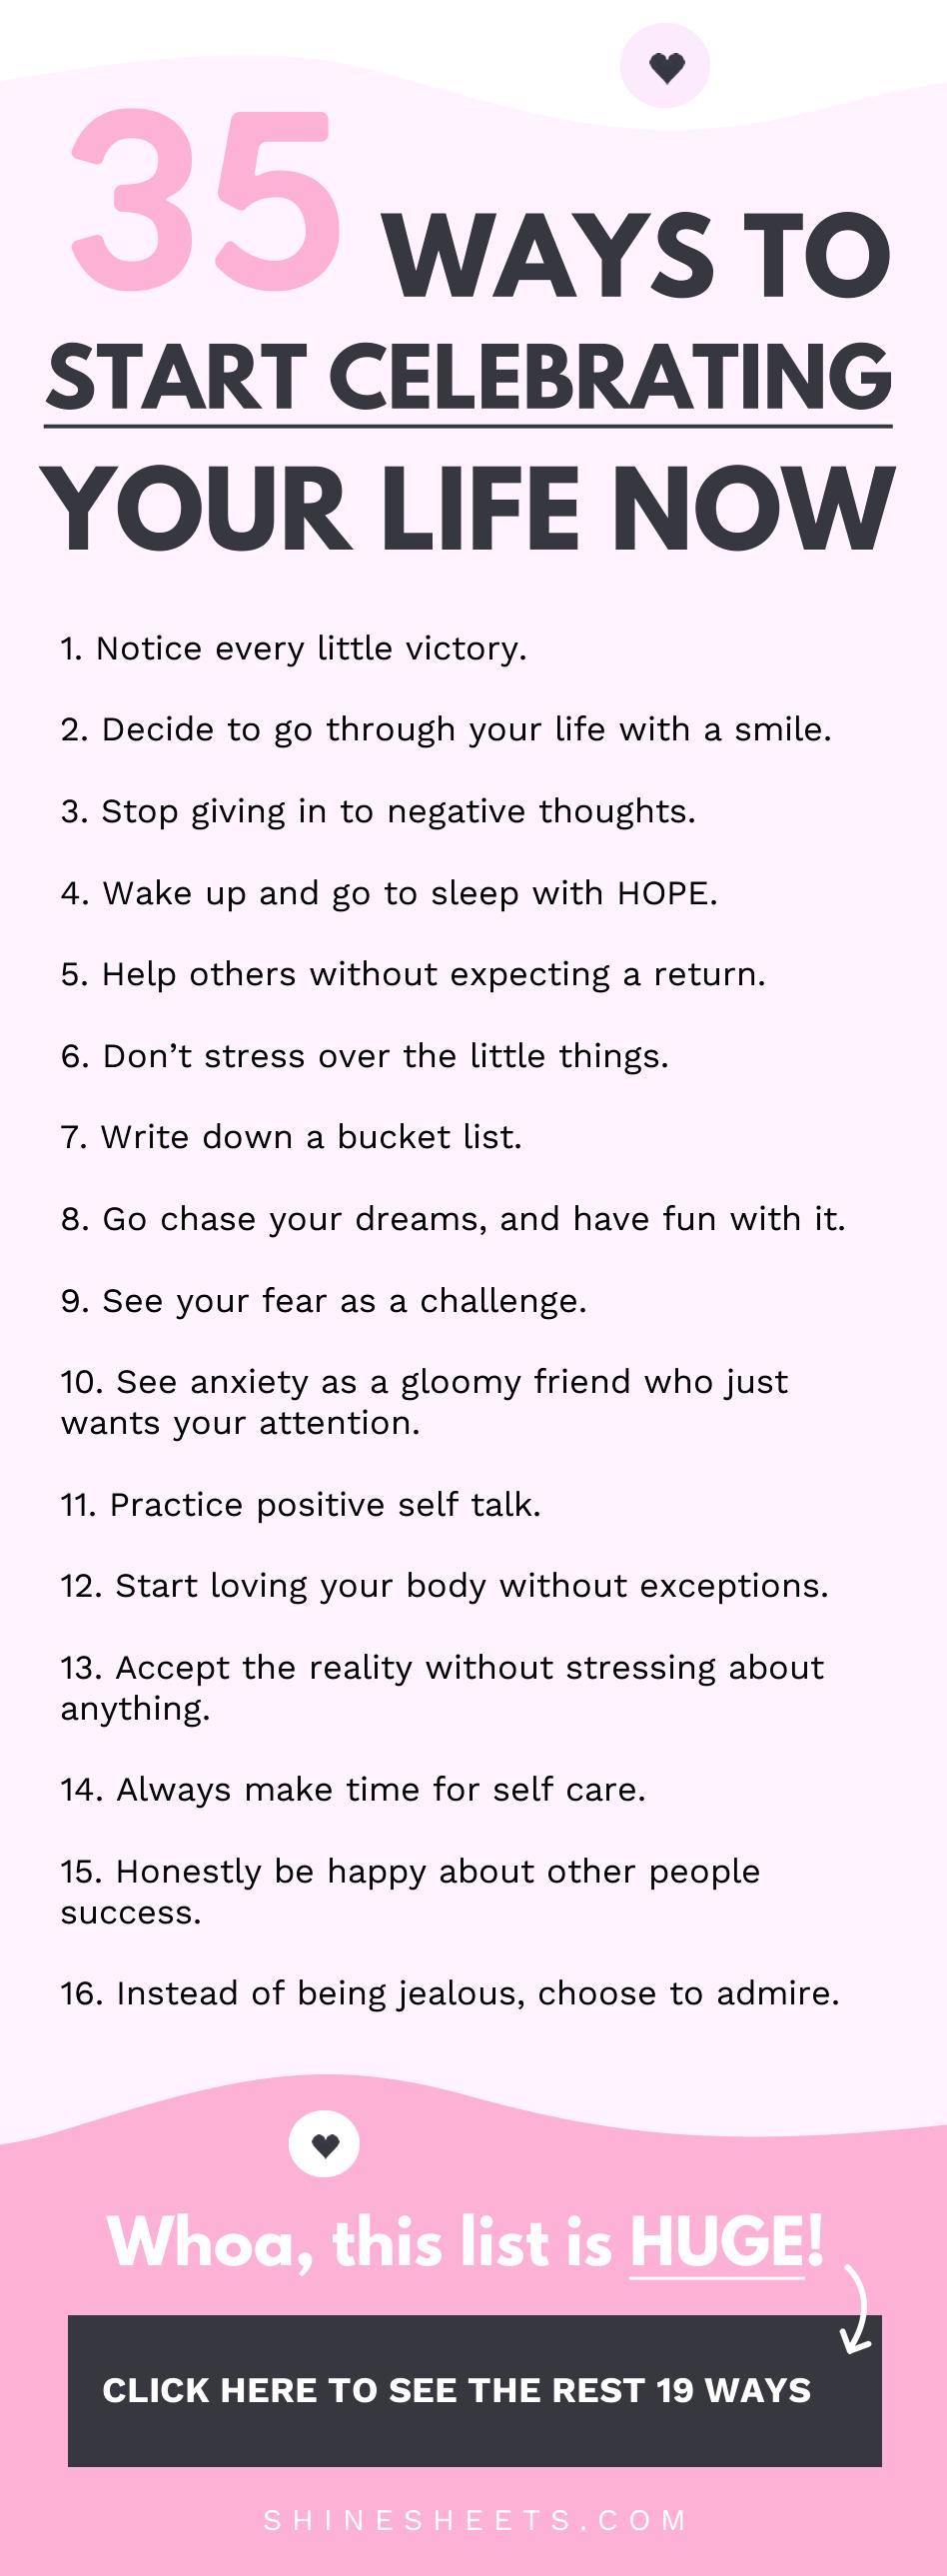 Make again to ways yourself happy 10 Ways